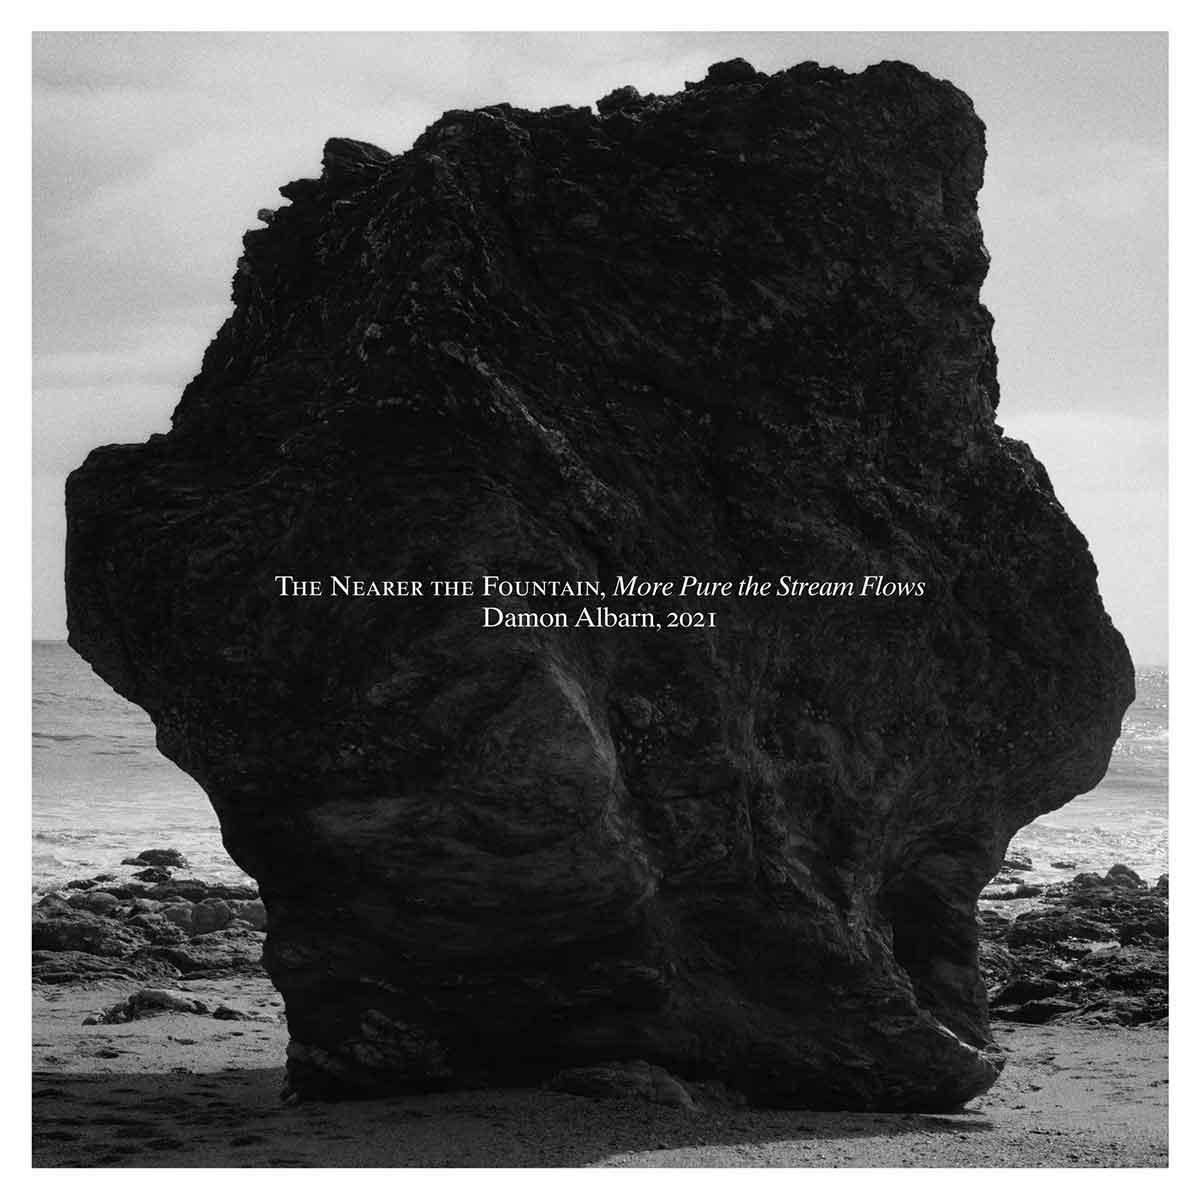 Tapa de The Nearer The Fountain, More Pure The Stream Flows, disco de Damon Albarn